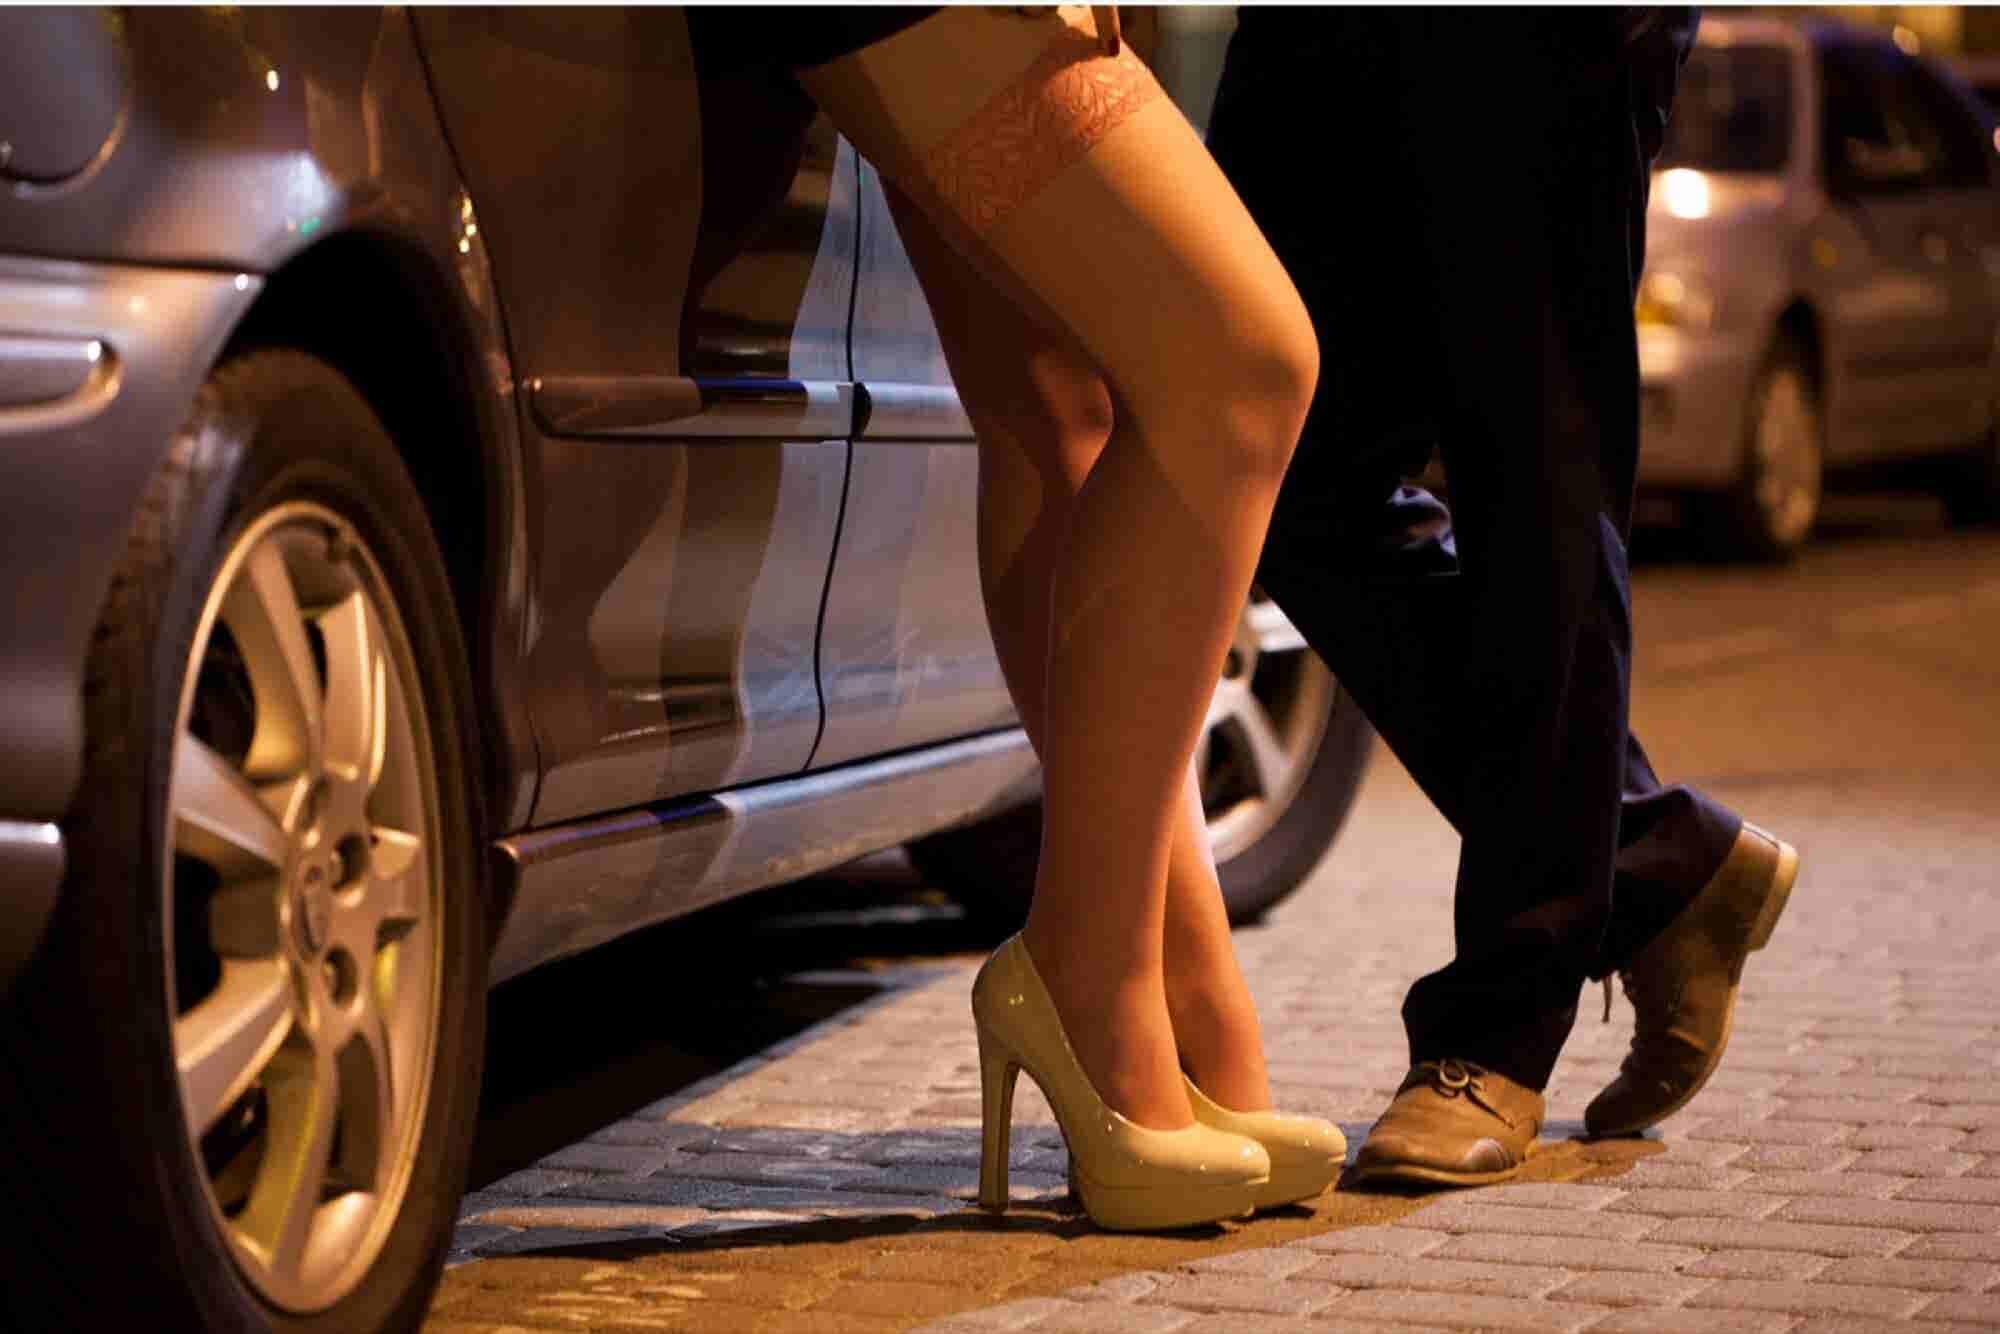 Will Decriminalization of Sex Work Become the Next Anti-Regulation Battle?